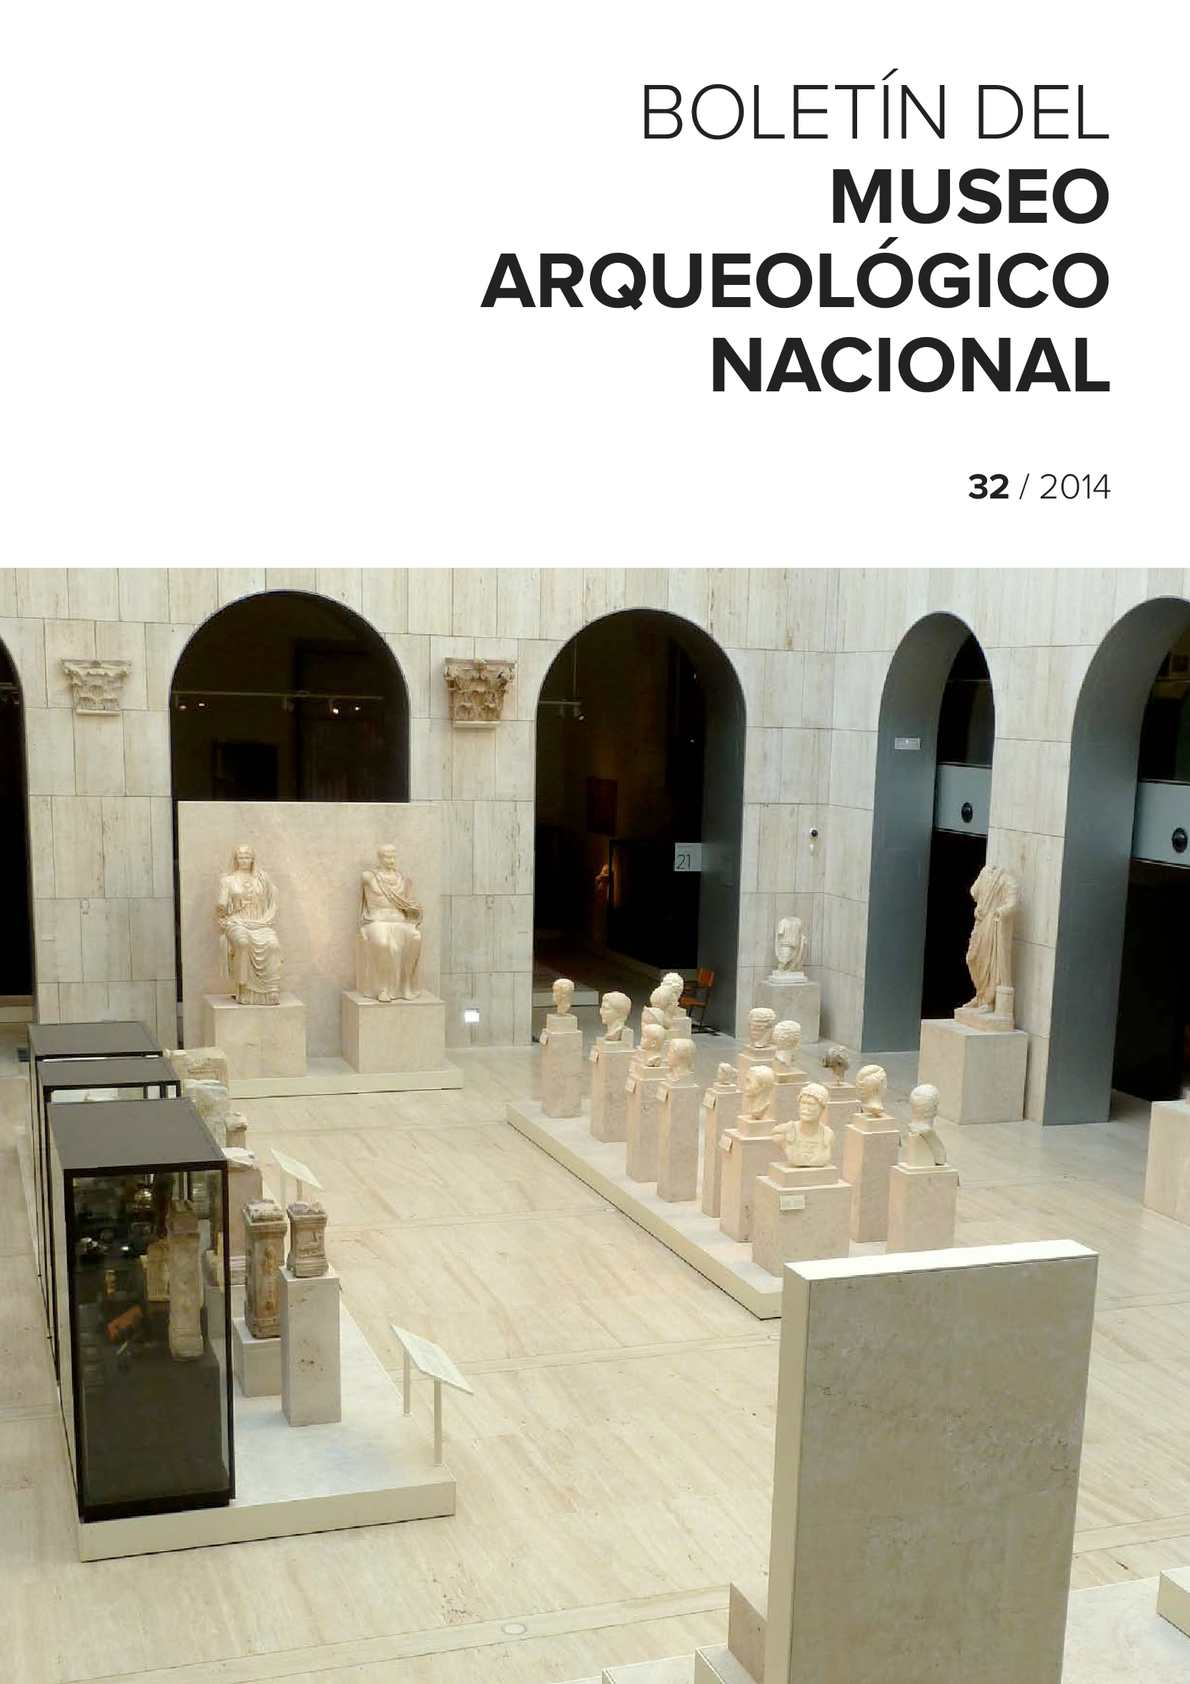 Calaméo - Boletín del Museo Arqueológico Nacional 32/2014